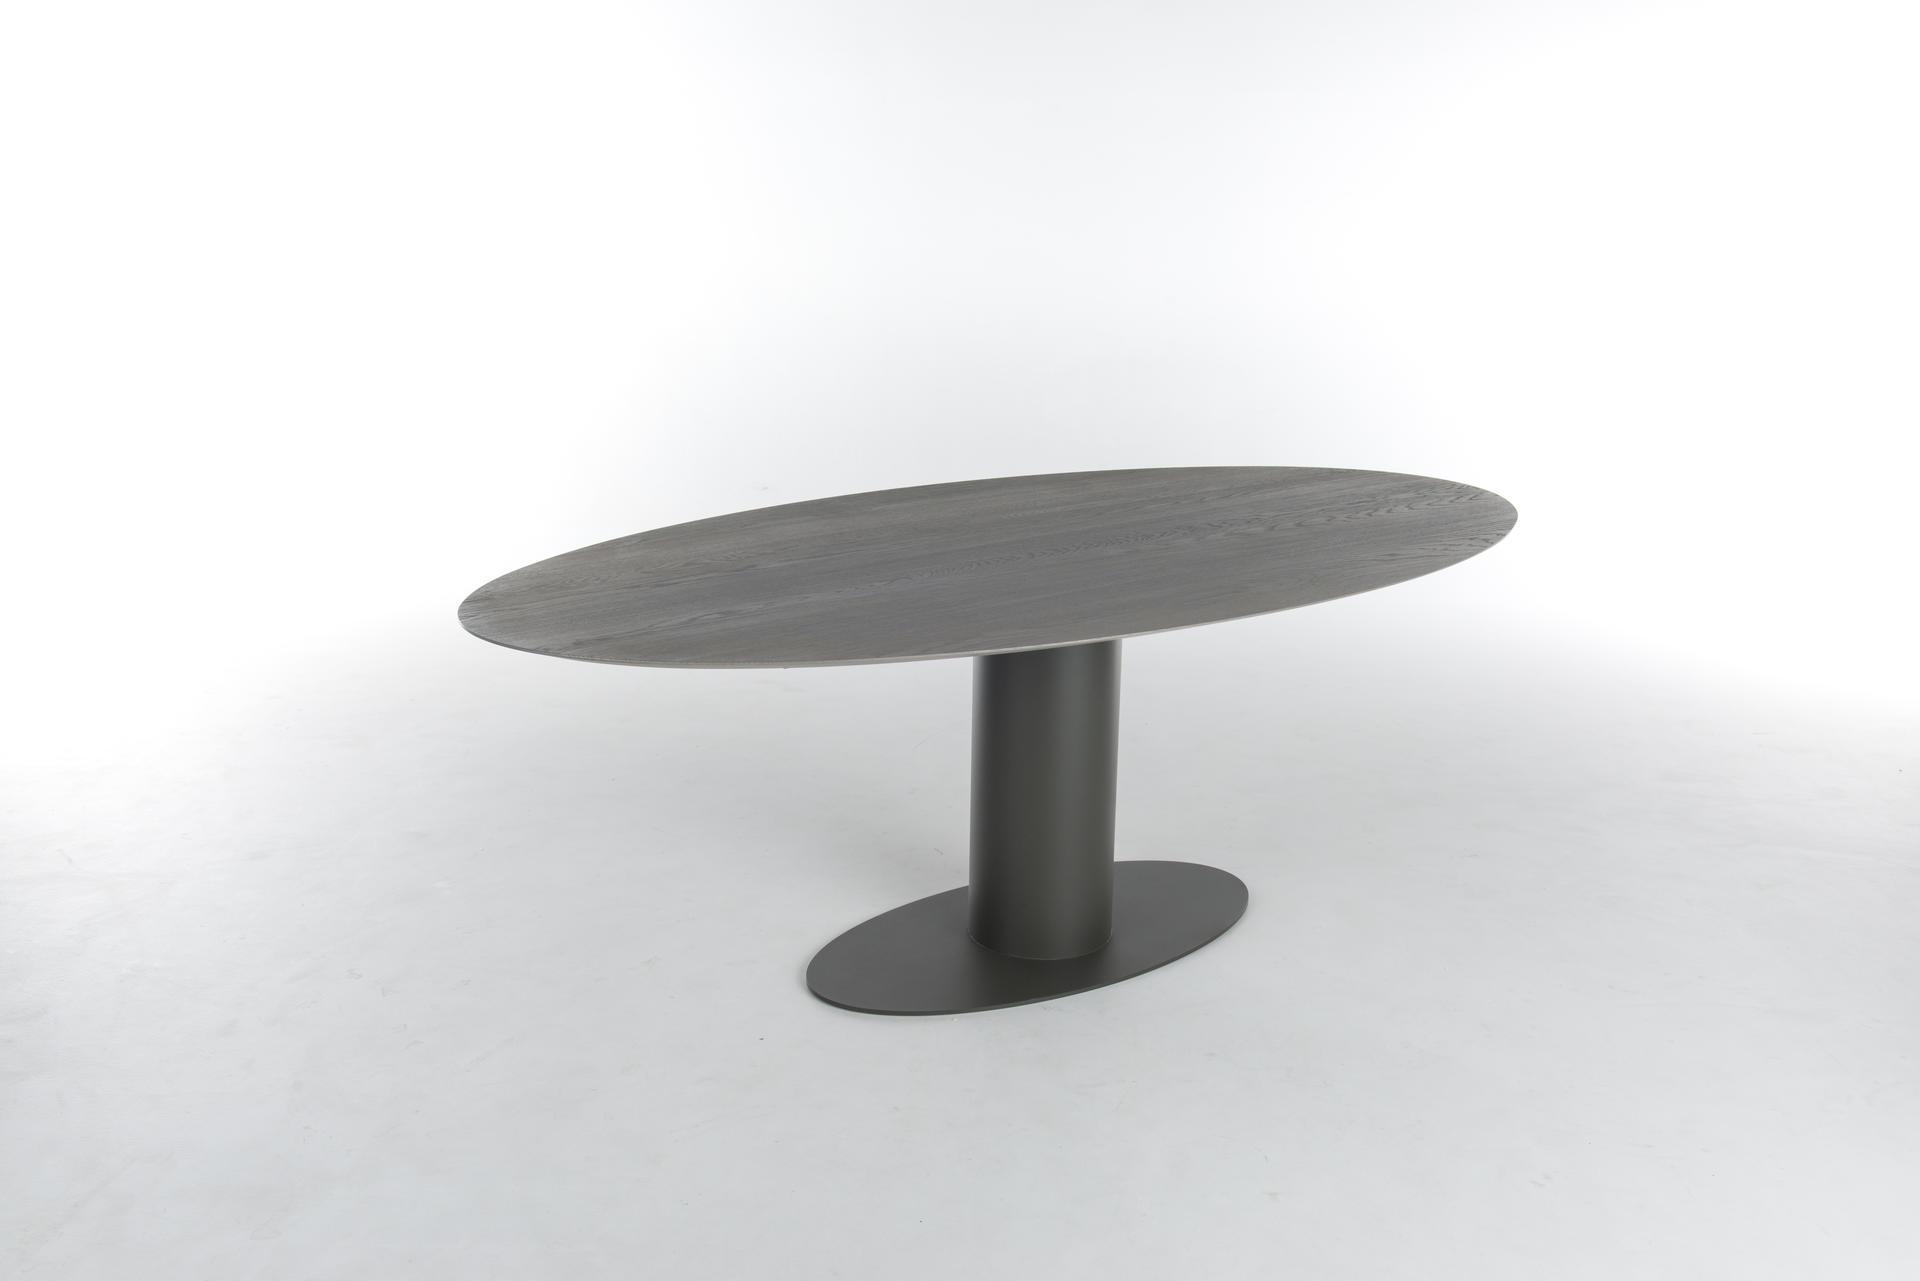 стол Oval, Bert Plantagie